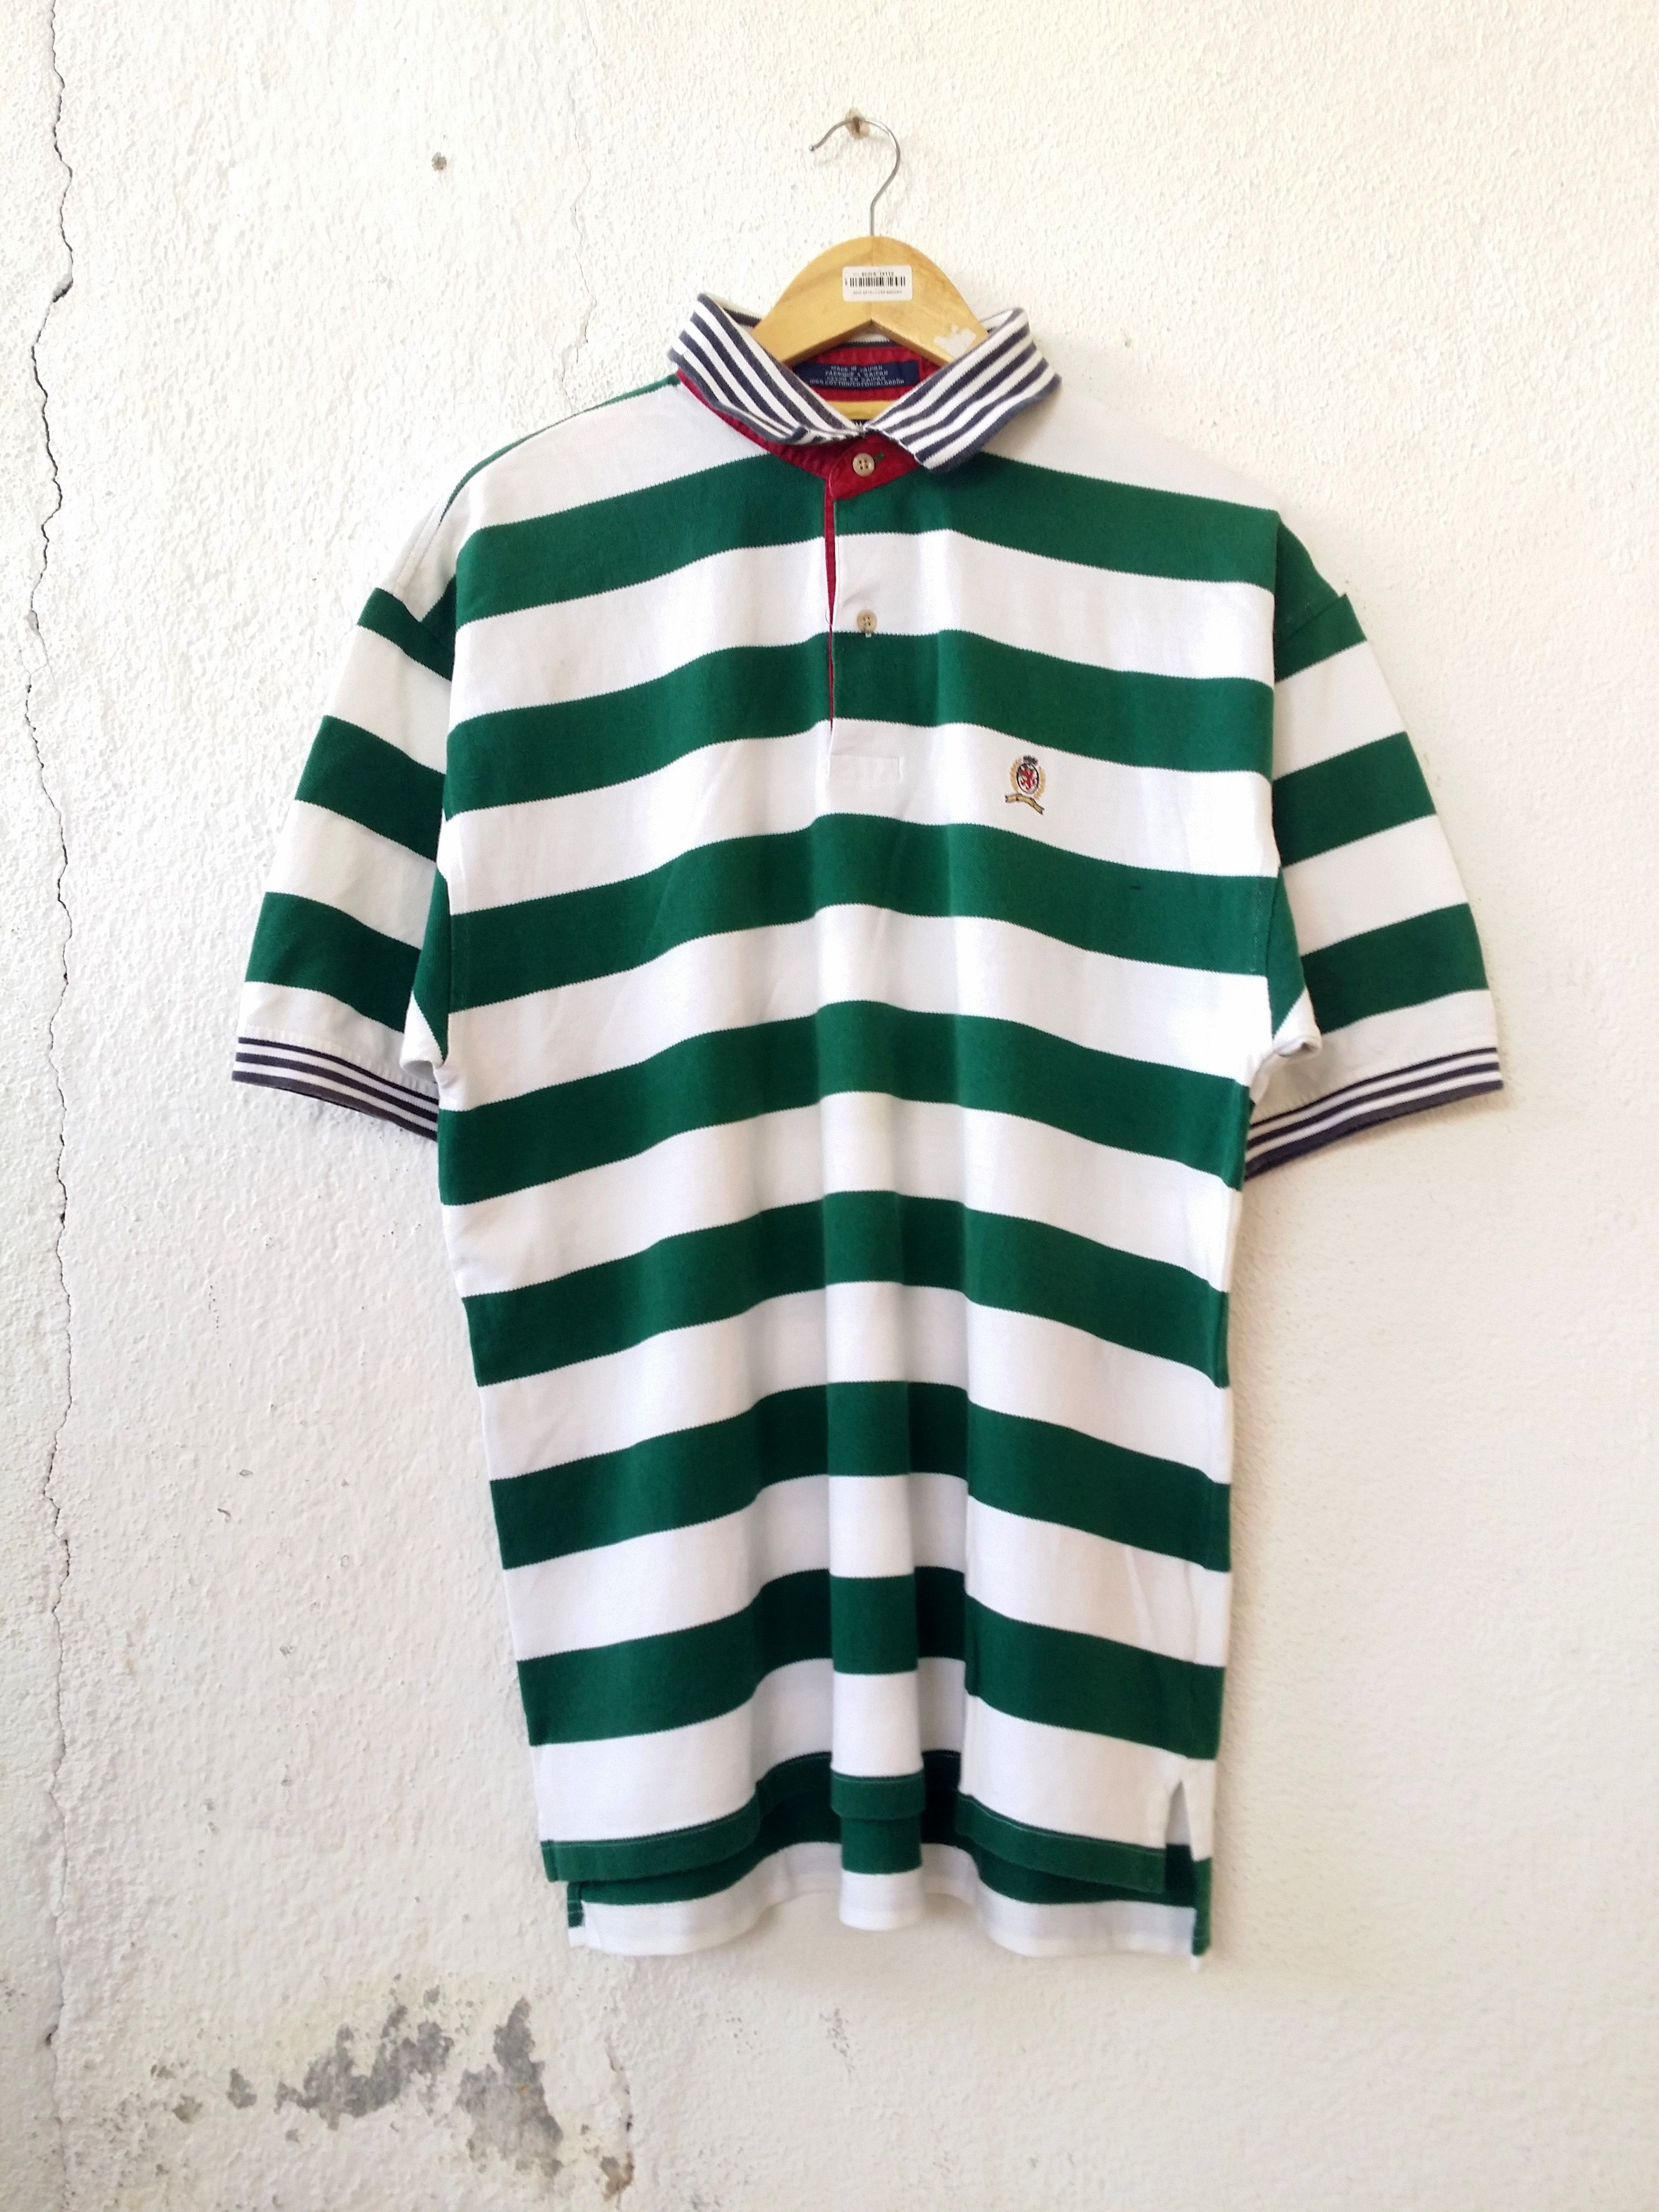 ffcca2b772 Tommy Hilfiger Polo Shirt Stripe Urban Style Tee Size L